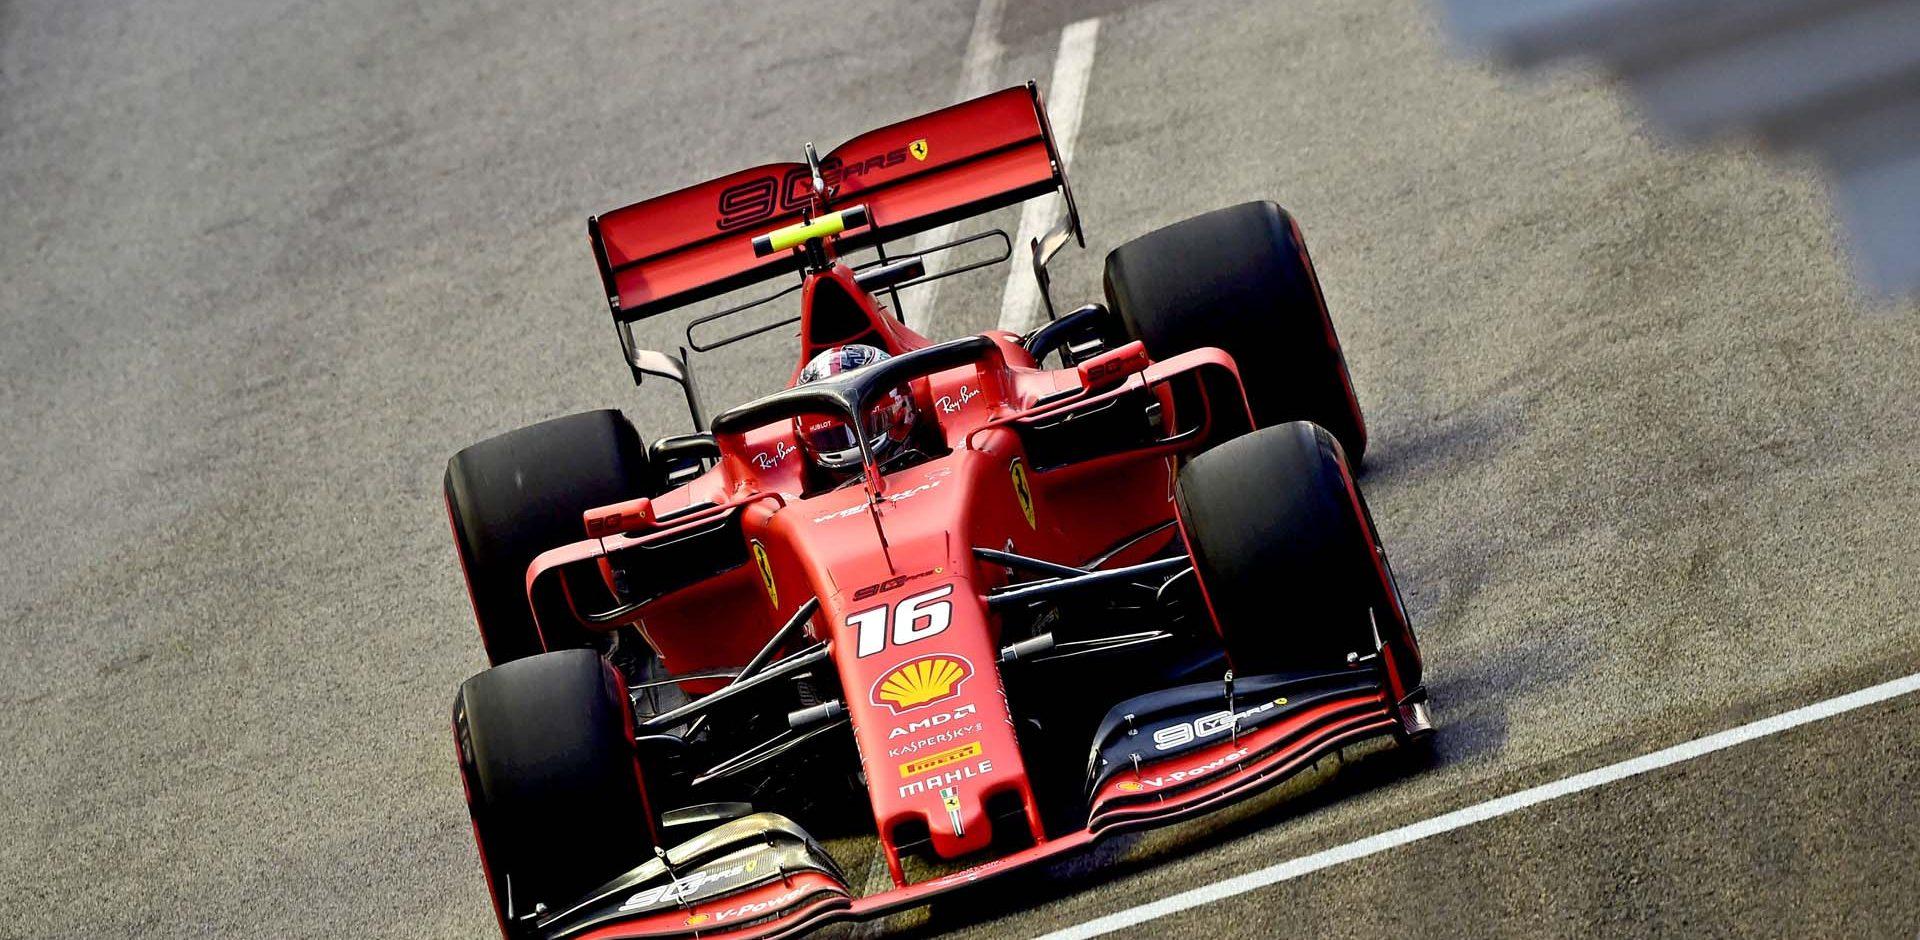 GP SINGAPORE F1/2019 -  SABATO 21/09/2019   credit: @Scuderia Ferrari Press Office Charles Leclerc